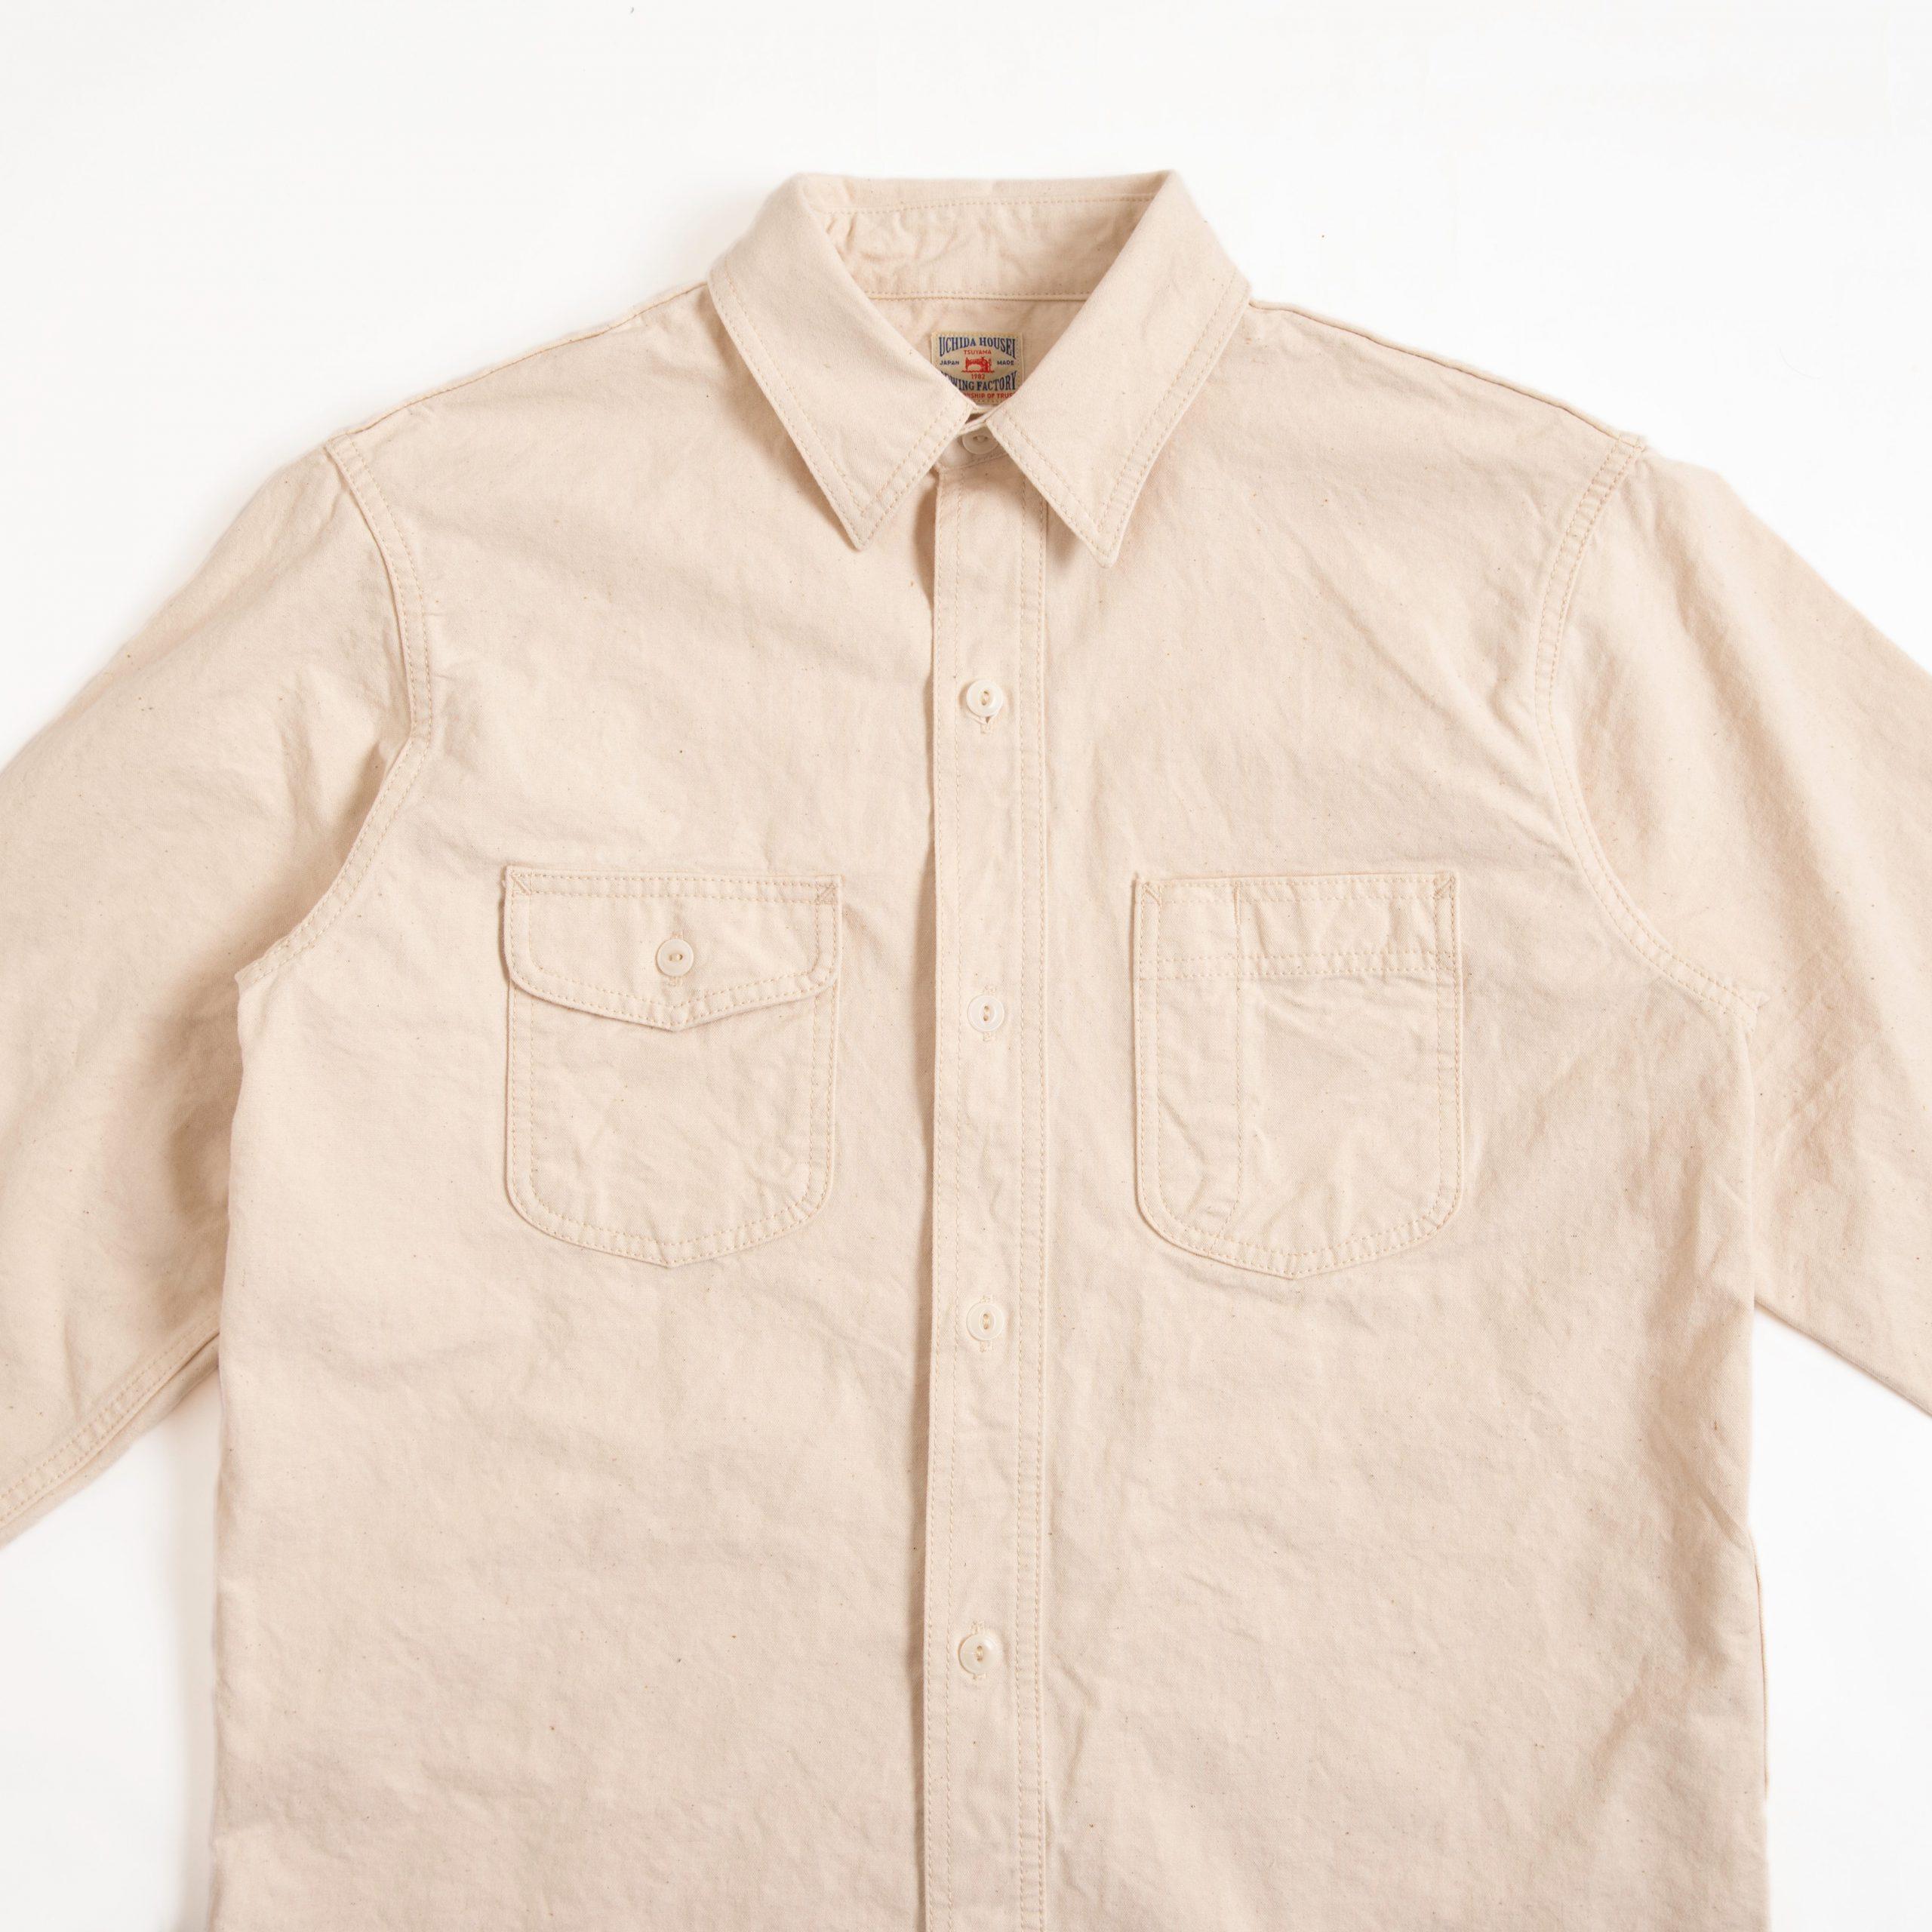 Canvas Work Shirt【帆布ワークシャツ】